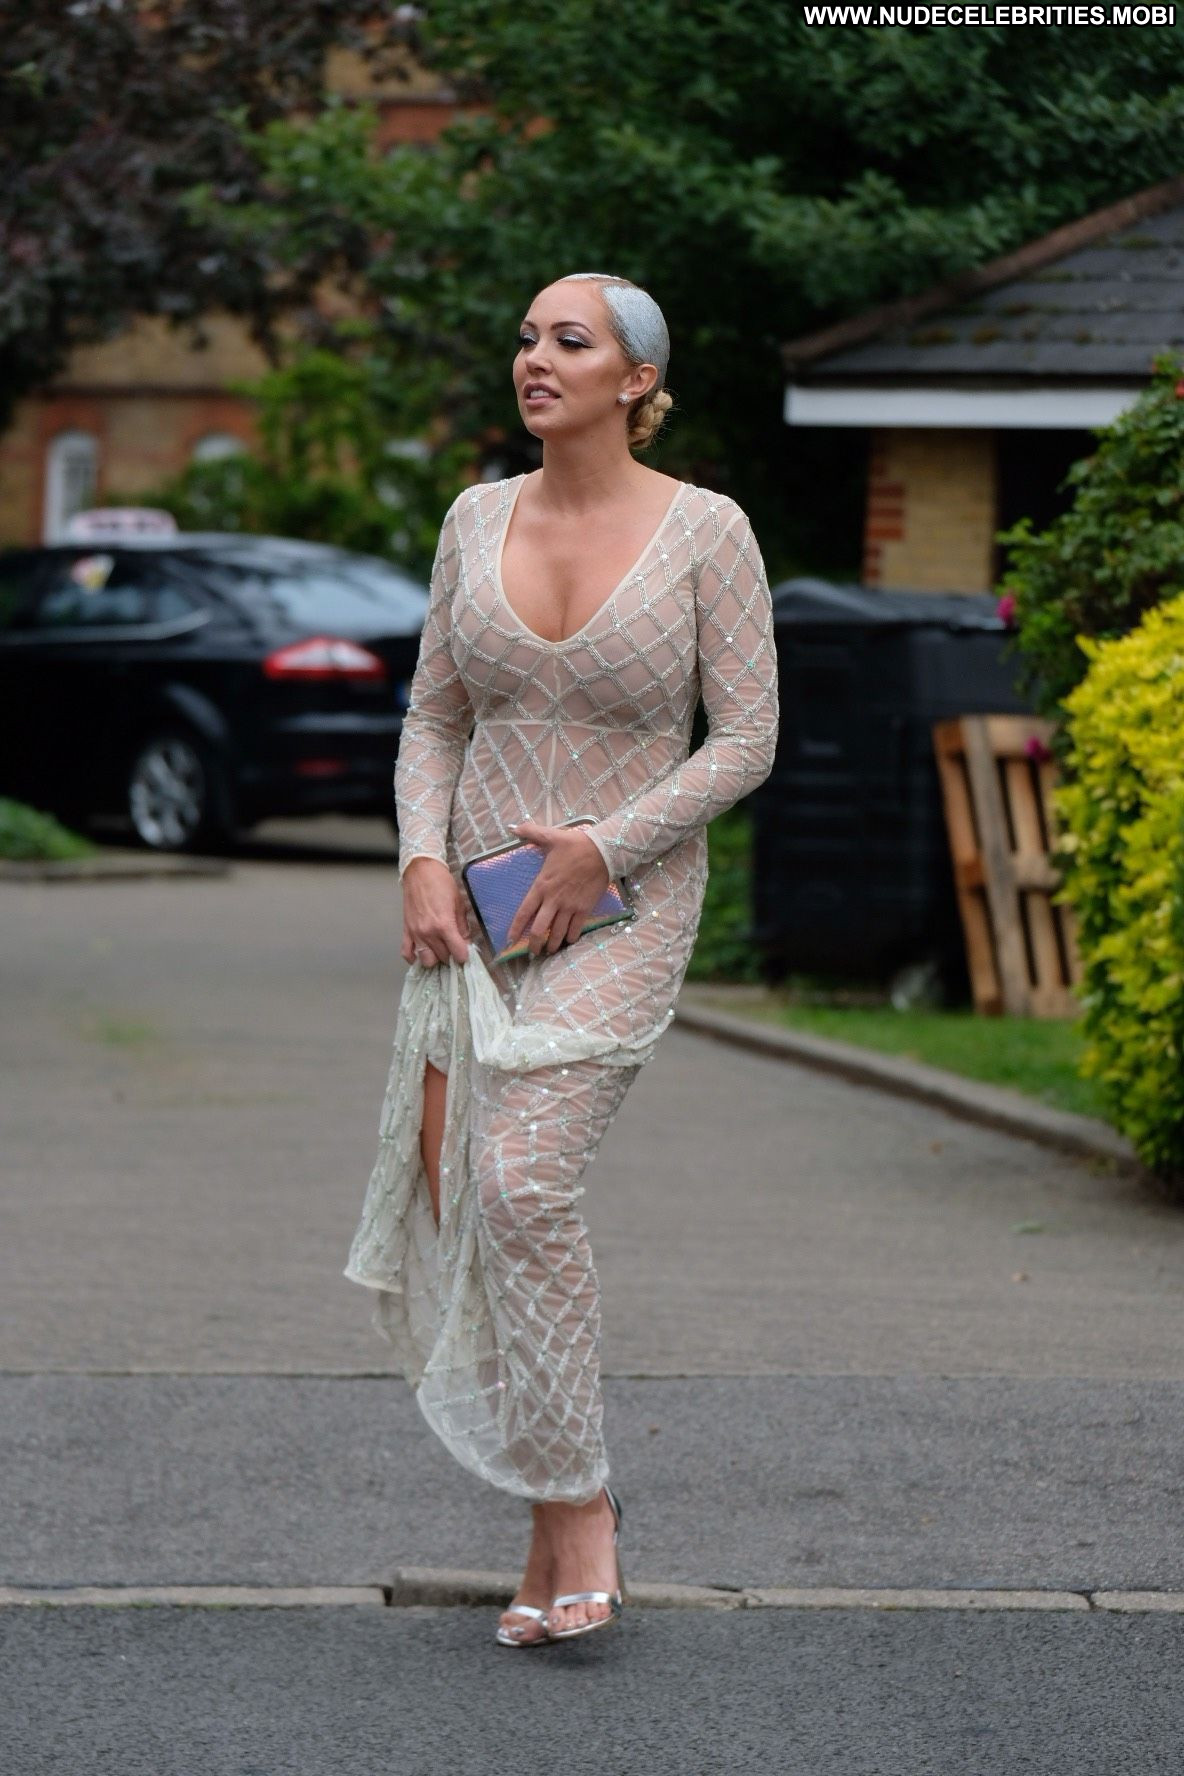 Aisleyne Horgan Wallace bares killer cleavage in